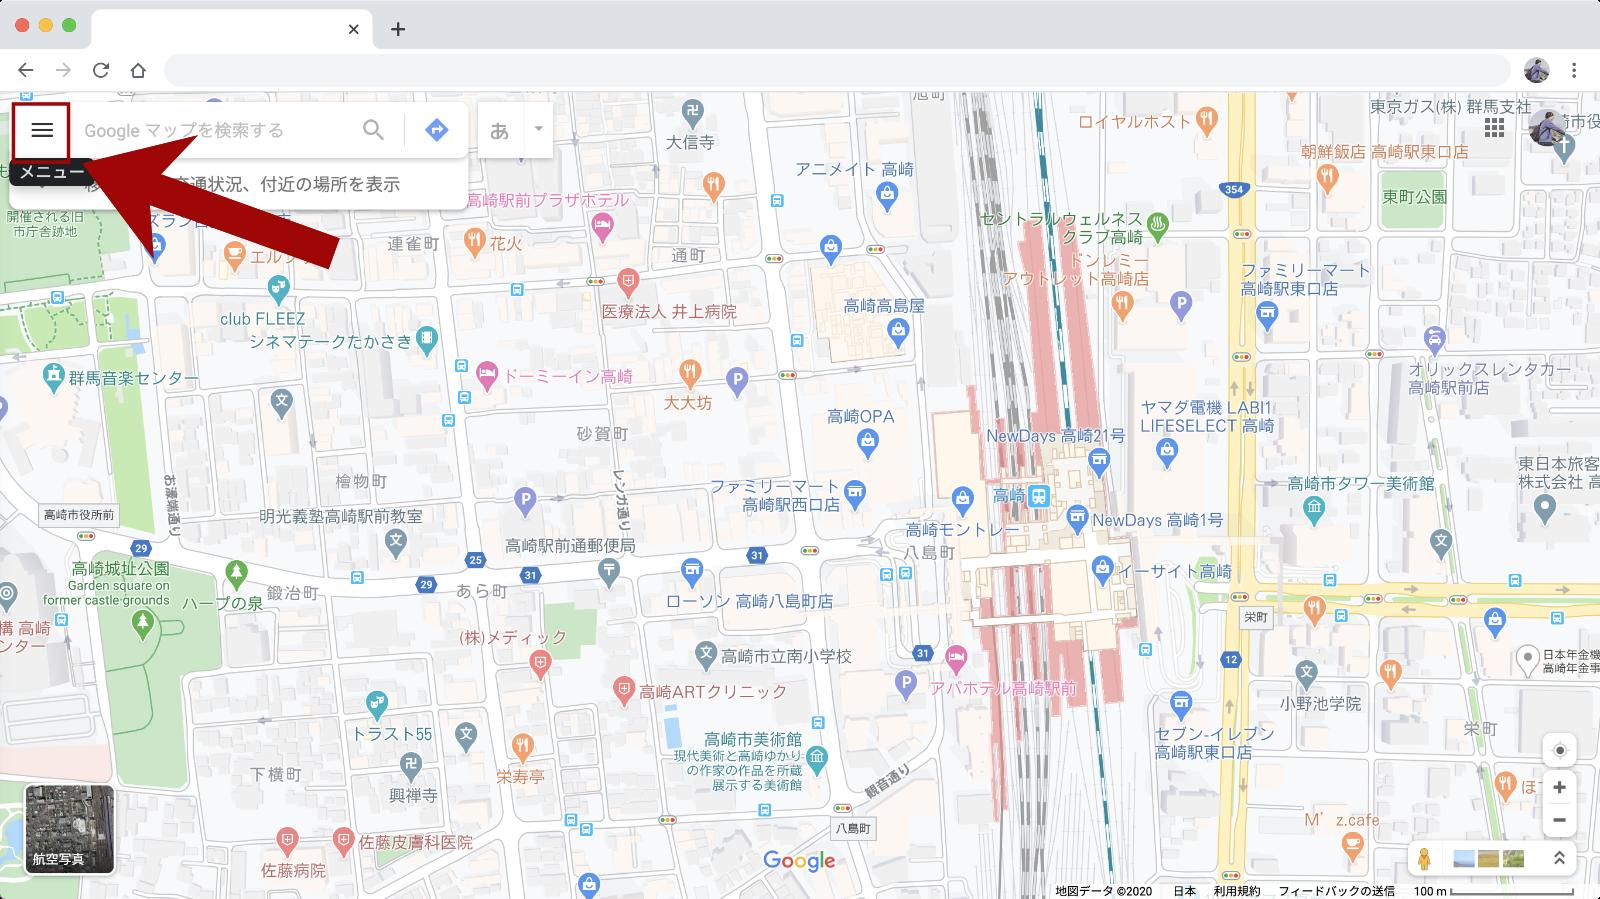 Googleマップのメニューを開く